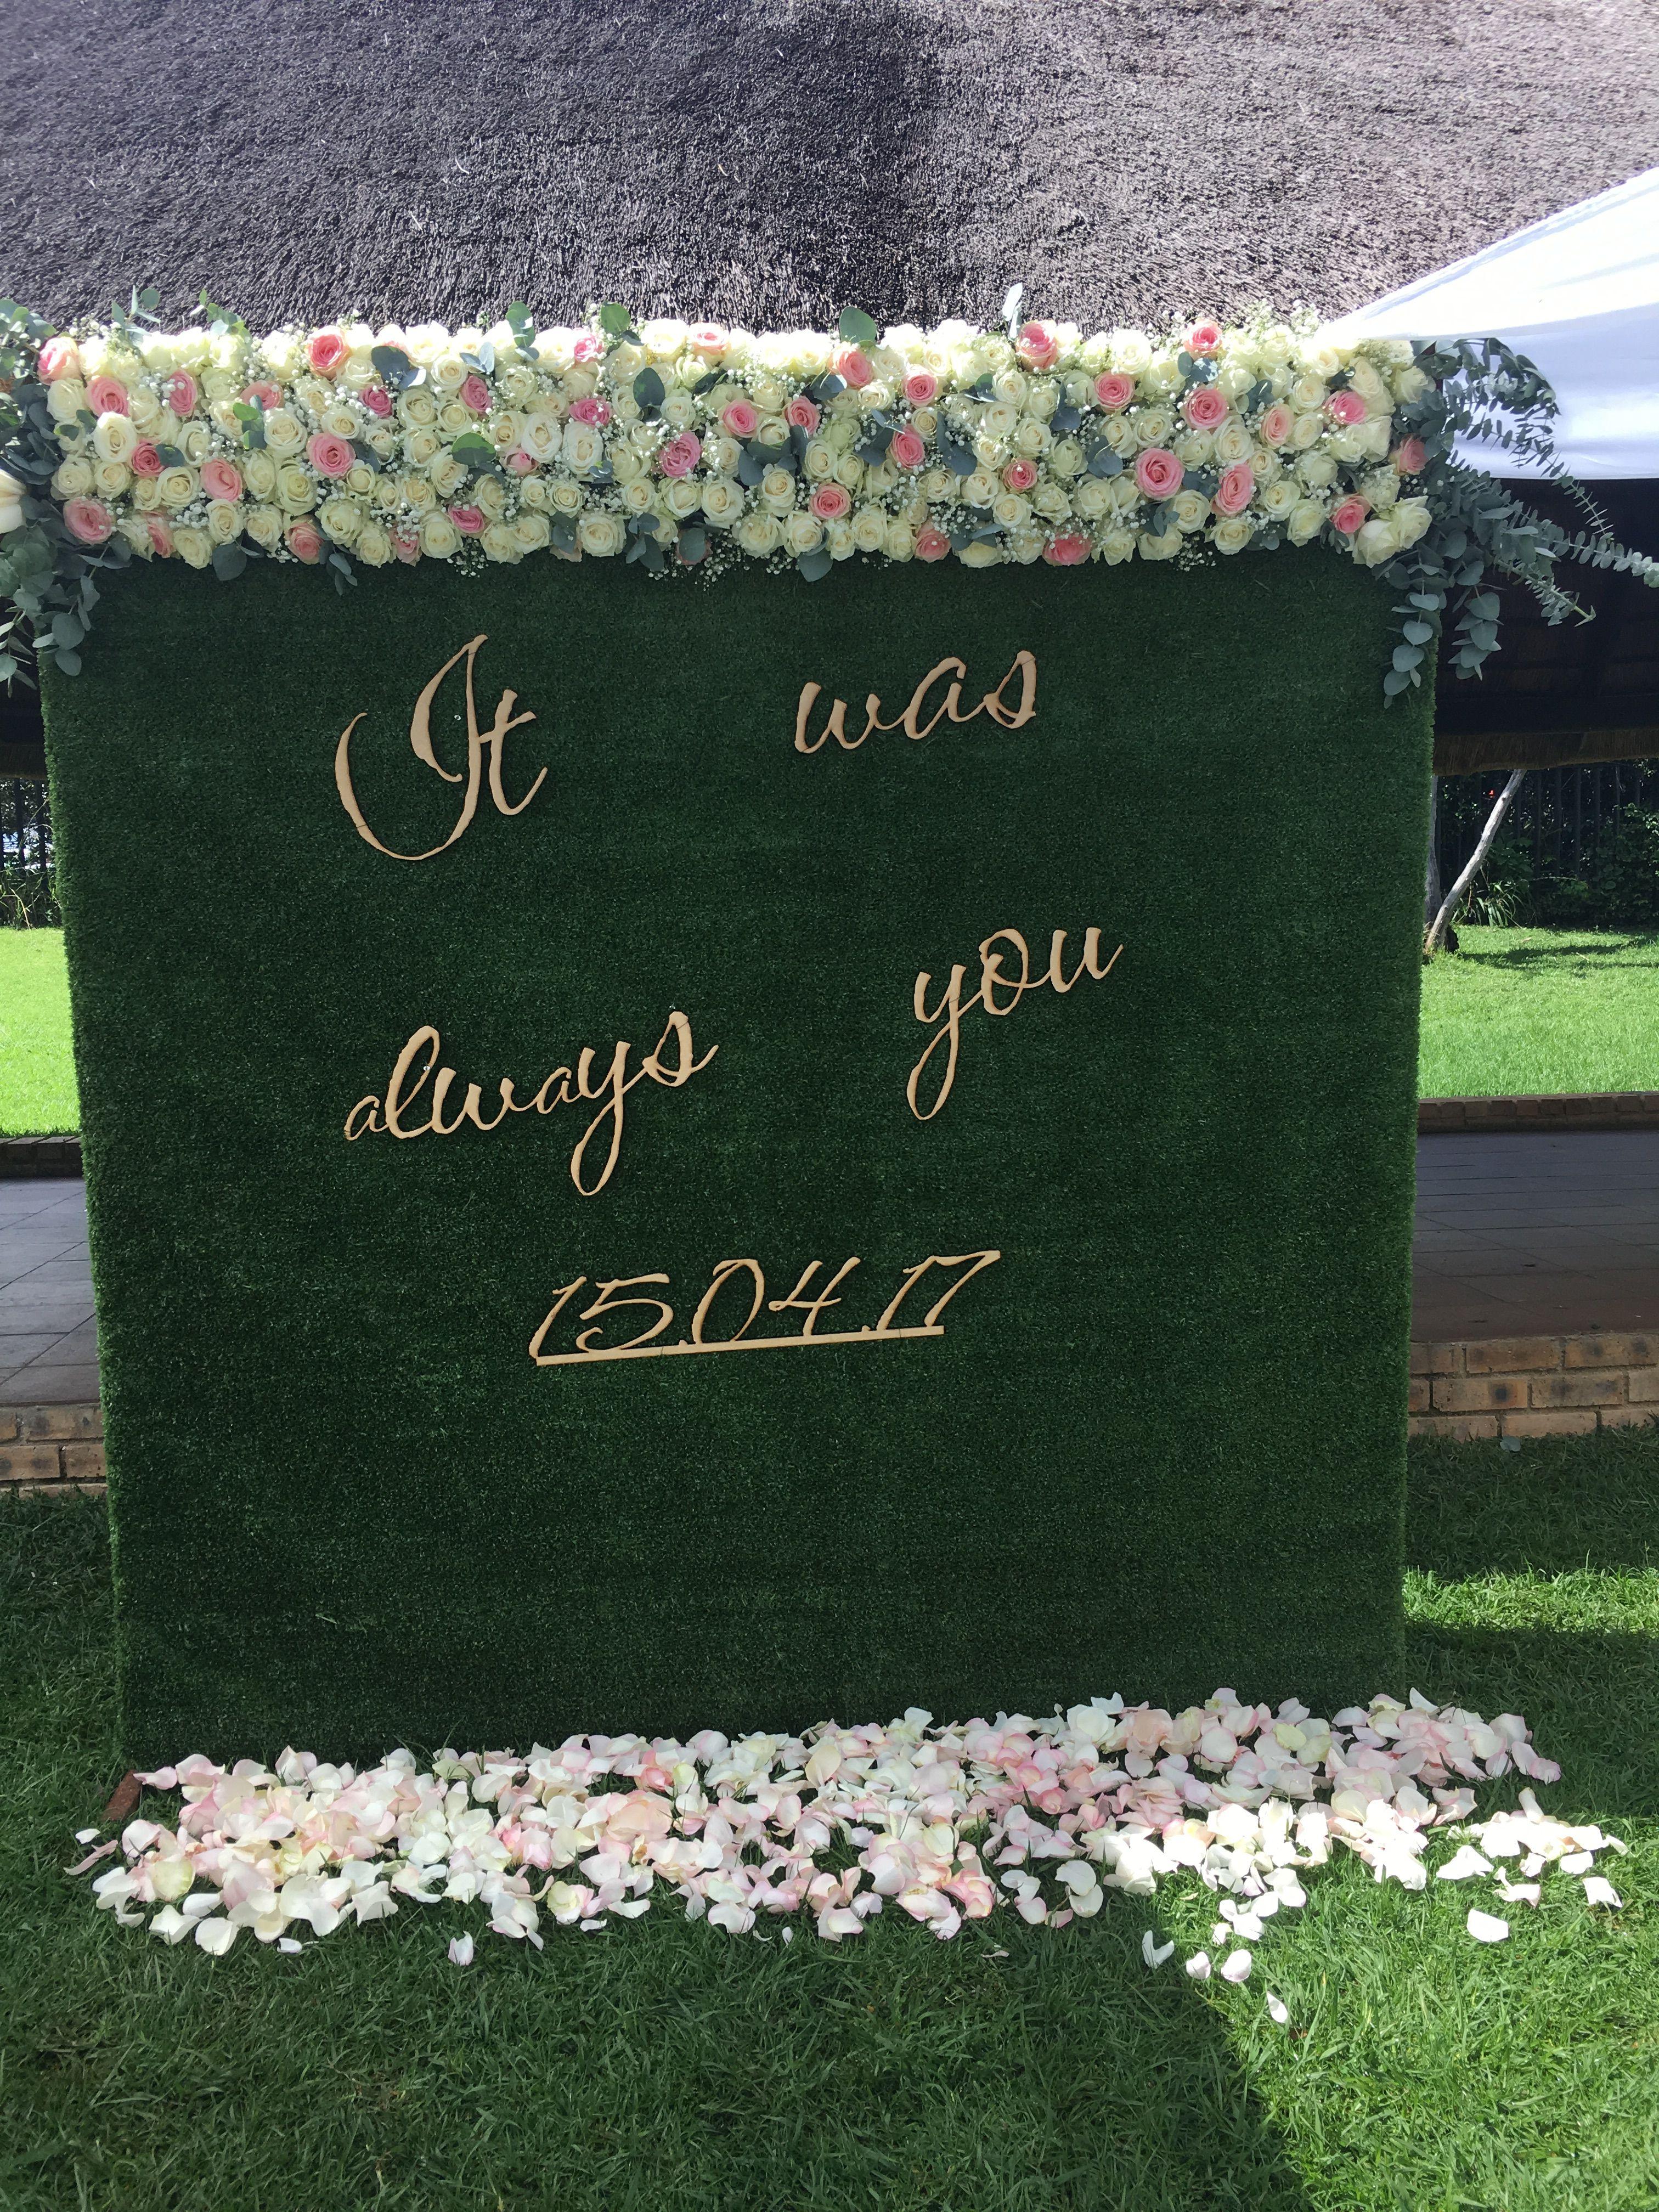 Matrimonial ceremony backdrop #VicWedsAsh #RosePetals #ItWasAlwaysYou #WalterSisuluBotanicalGardens #LokoWedCo